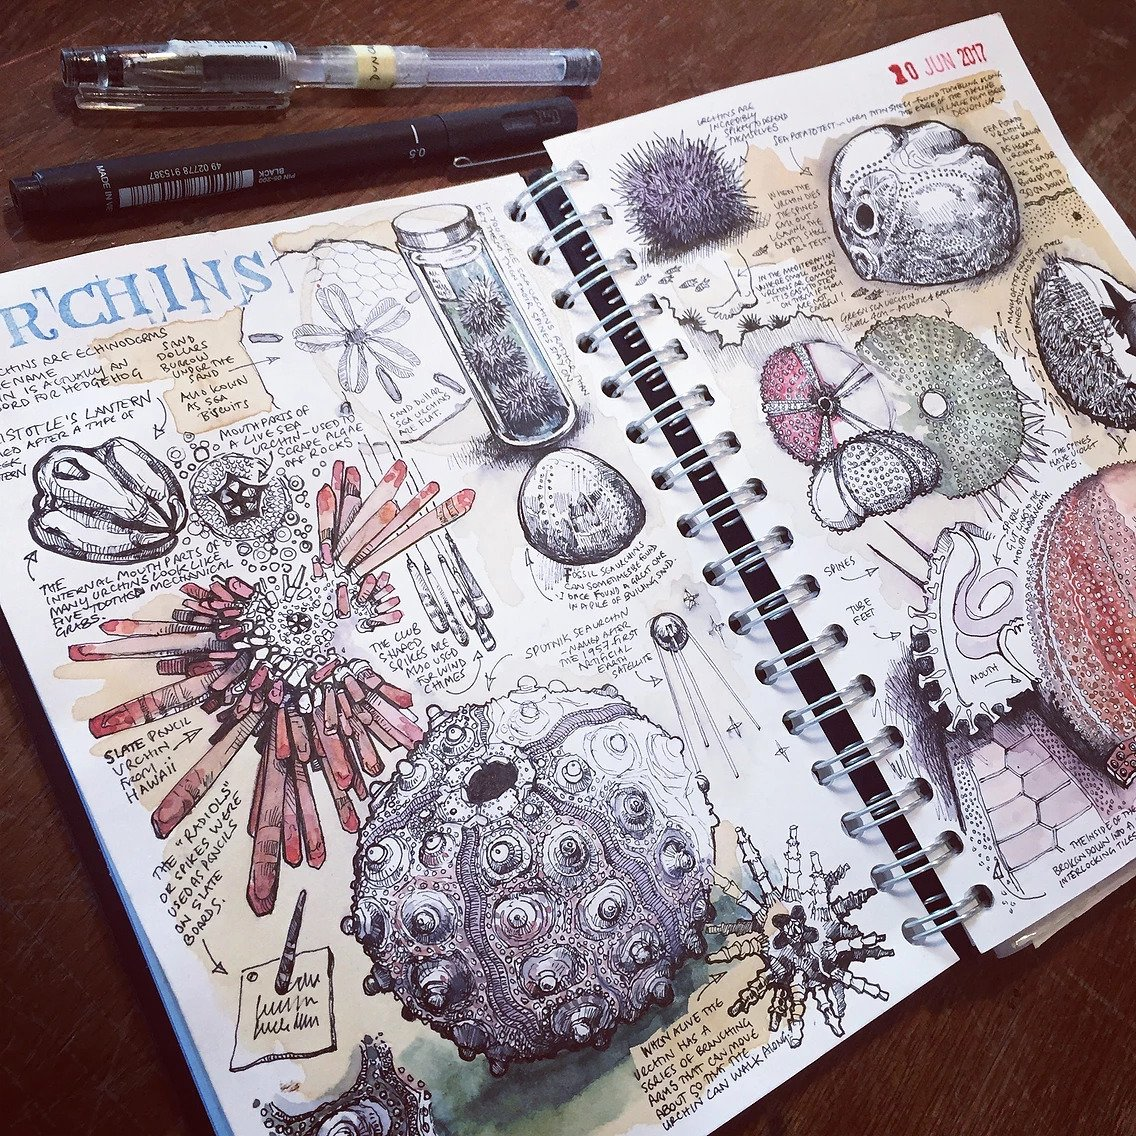 inspirational art sketchbooks Duncan Cameron